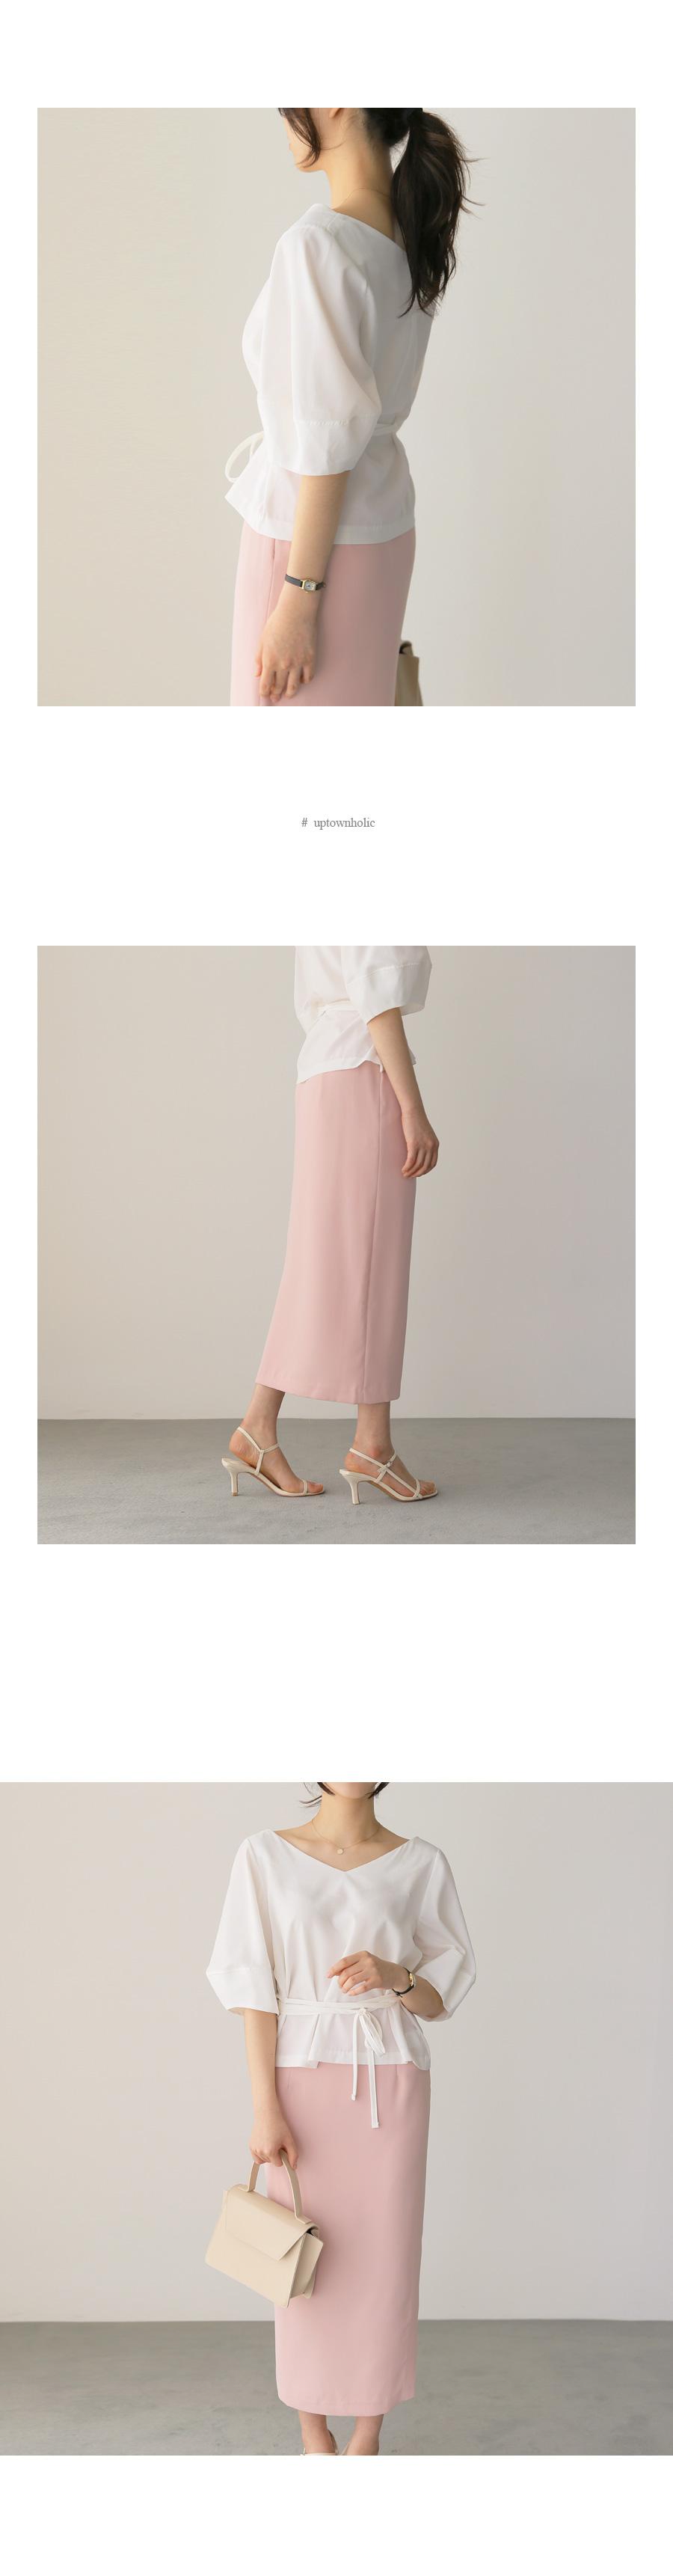 LINSUKA shoes